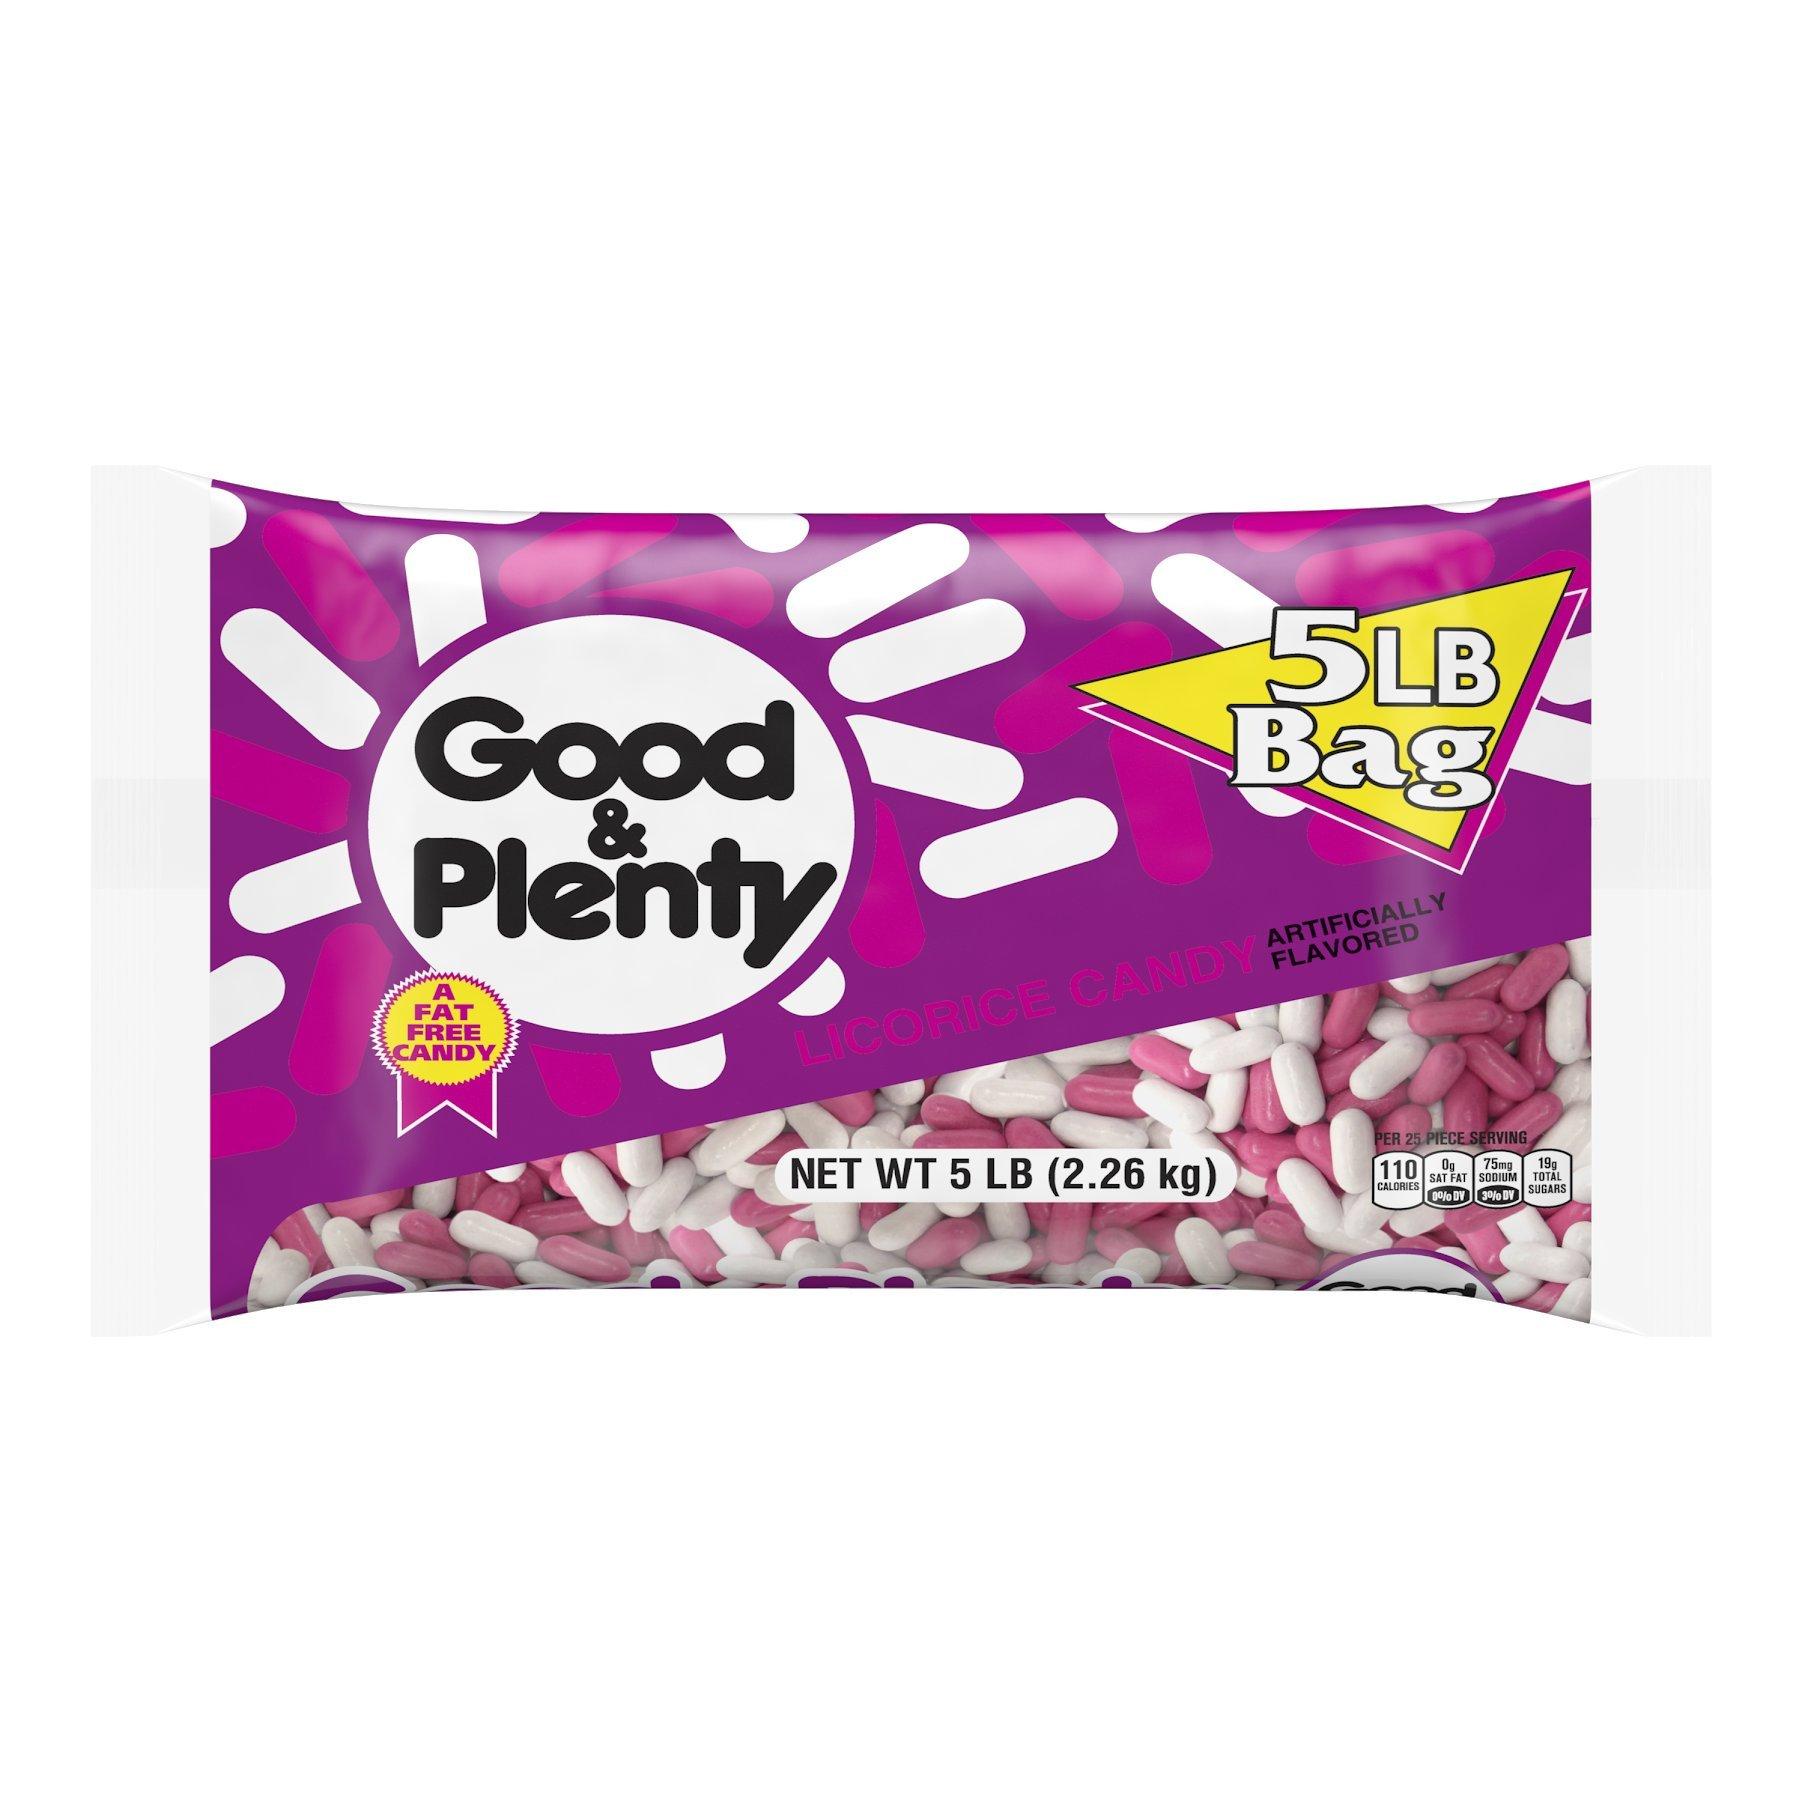 GOOD & PLENTY Licorice Candy, 5 Pound Bag